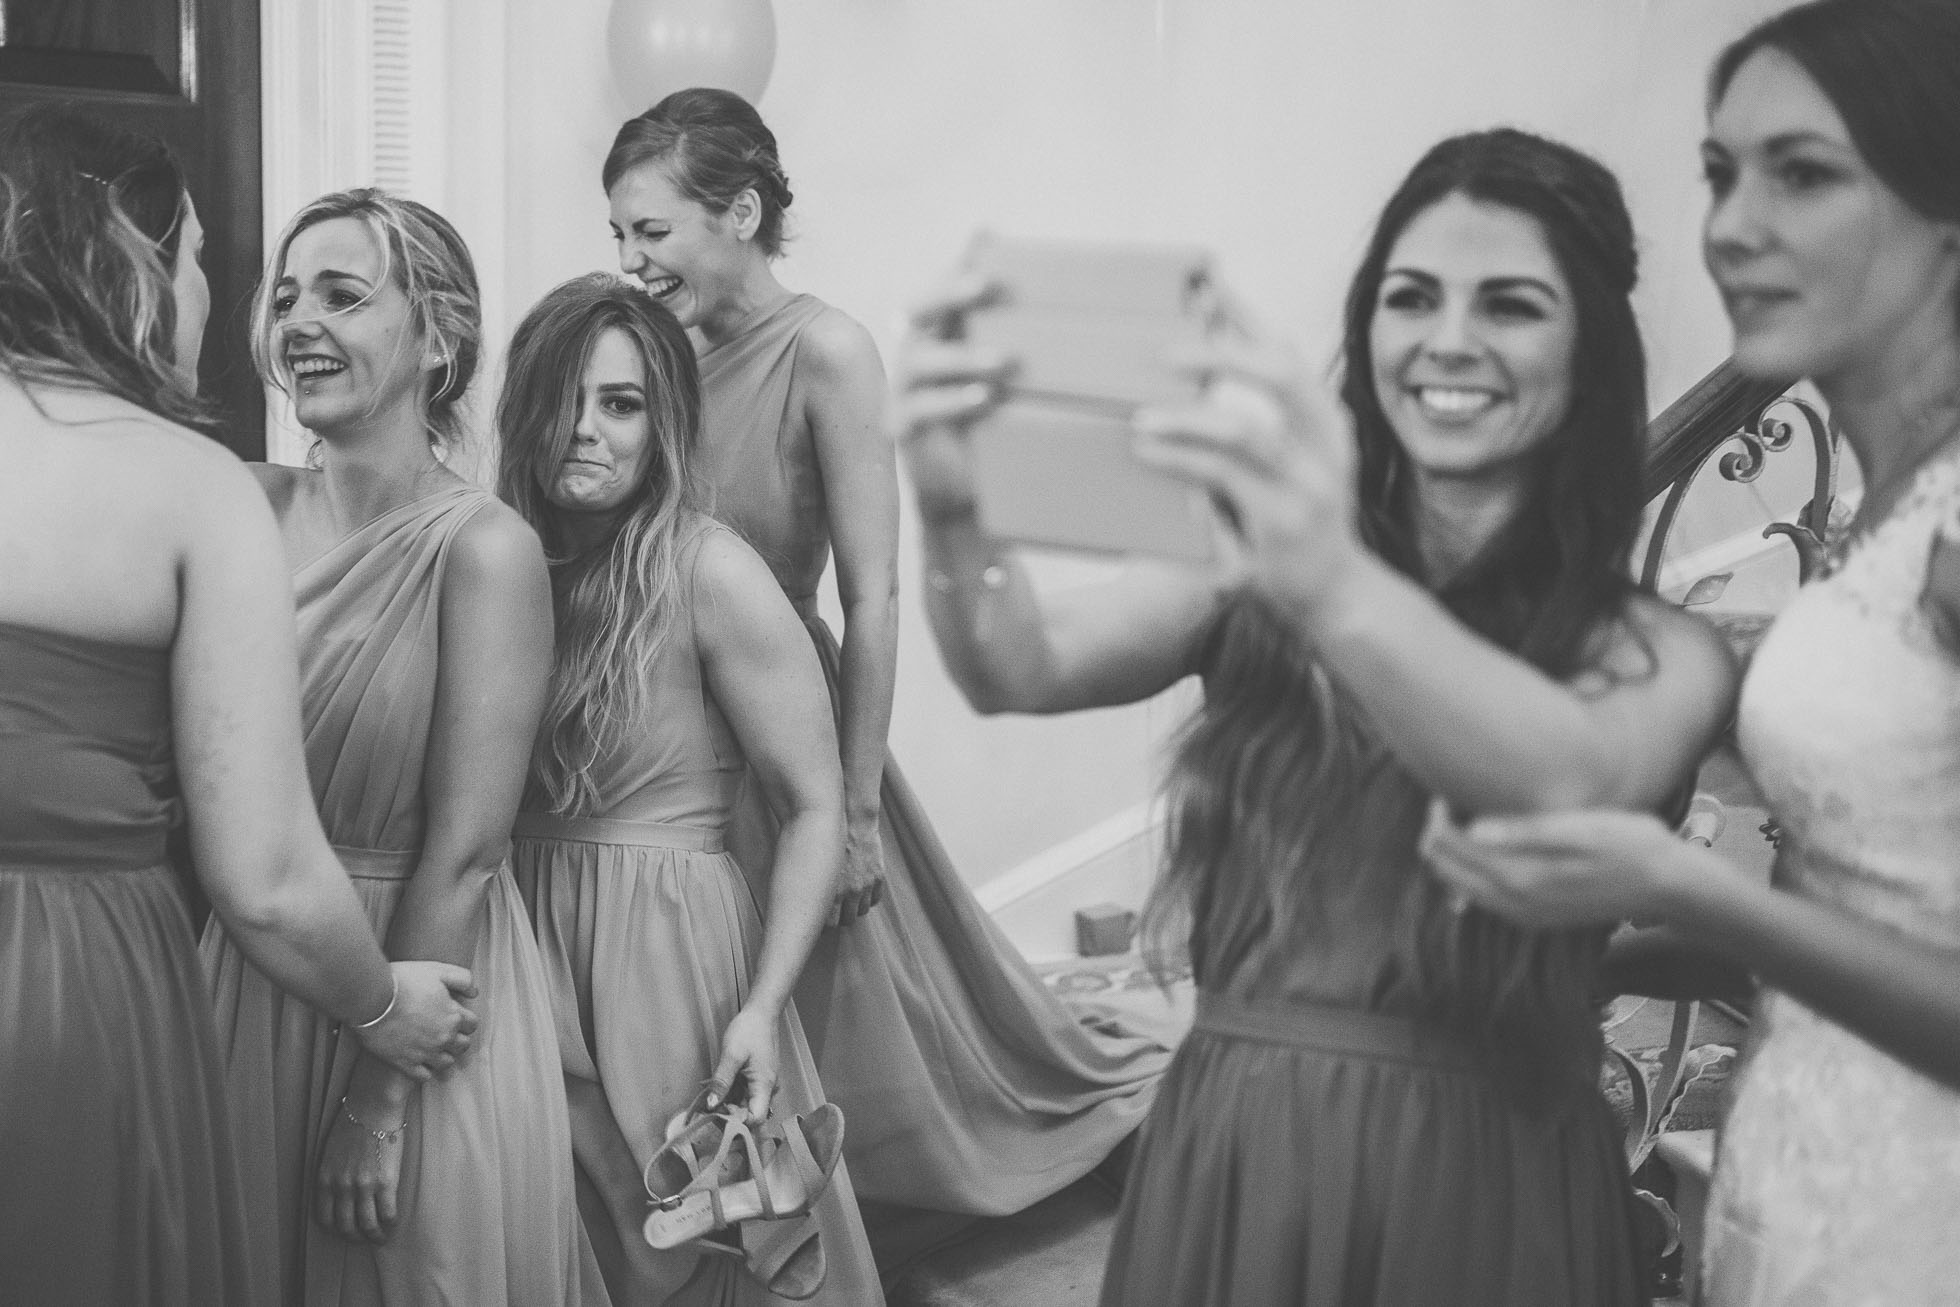 denton-hall-wedding-photographer-81.jpg